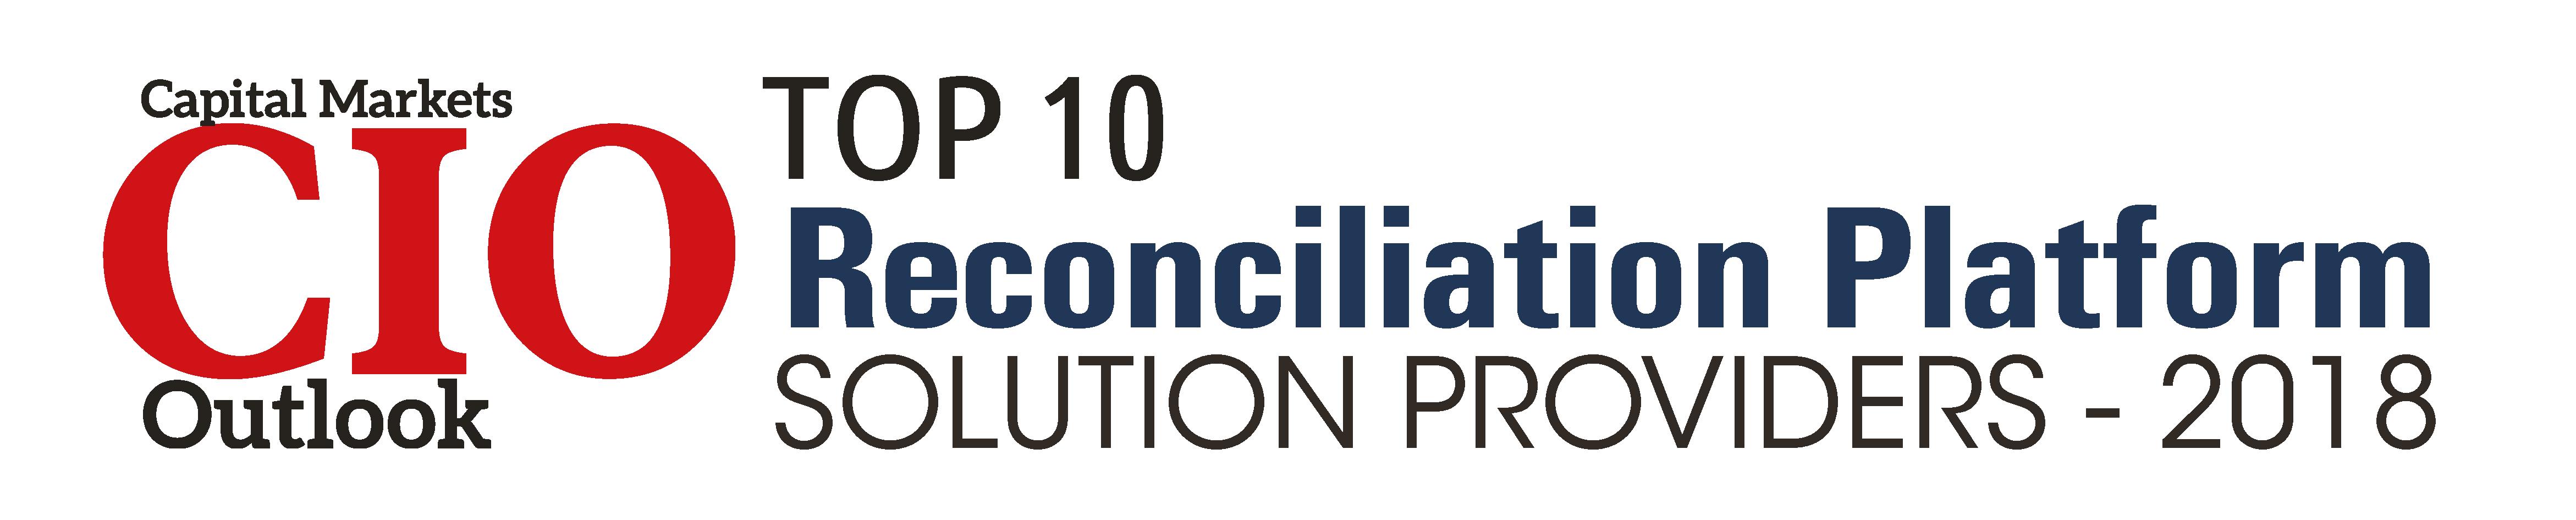 reconciliation_platform_2018_logo